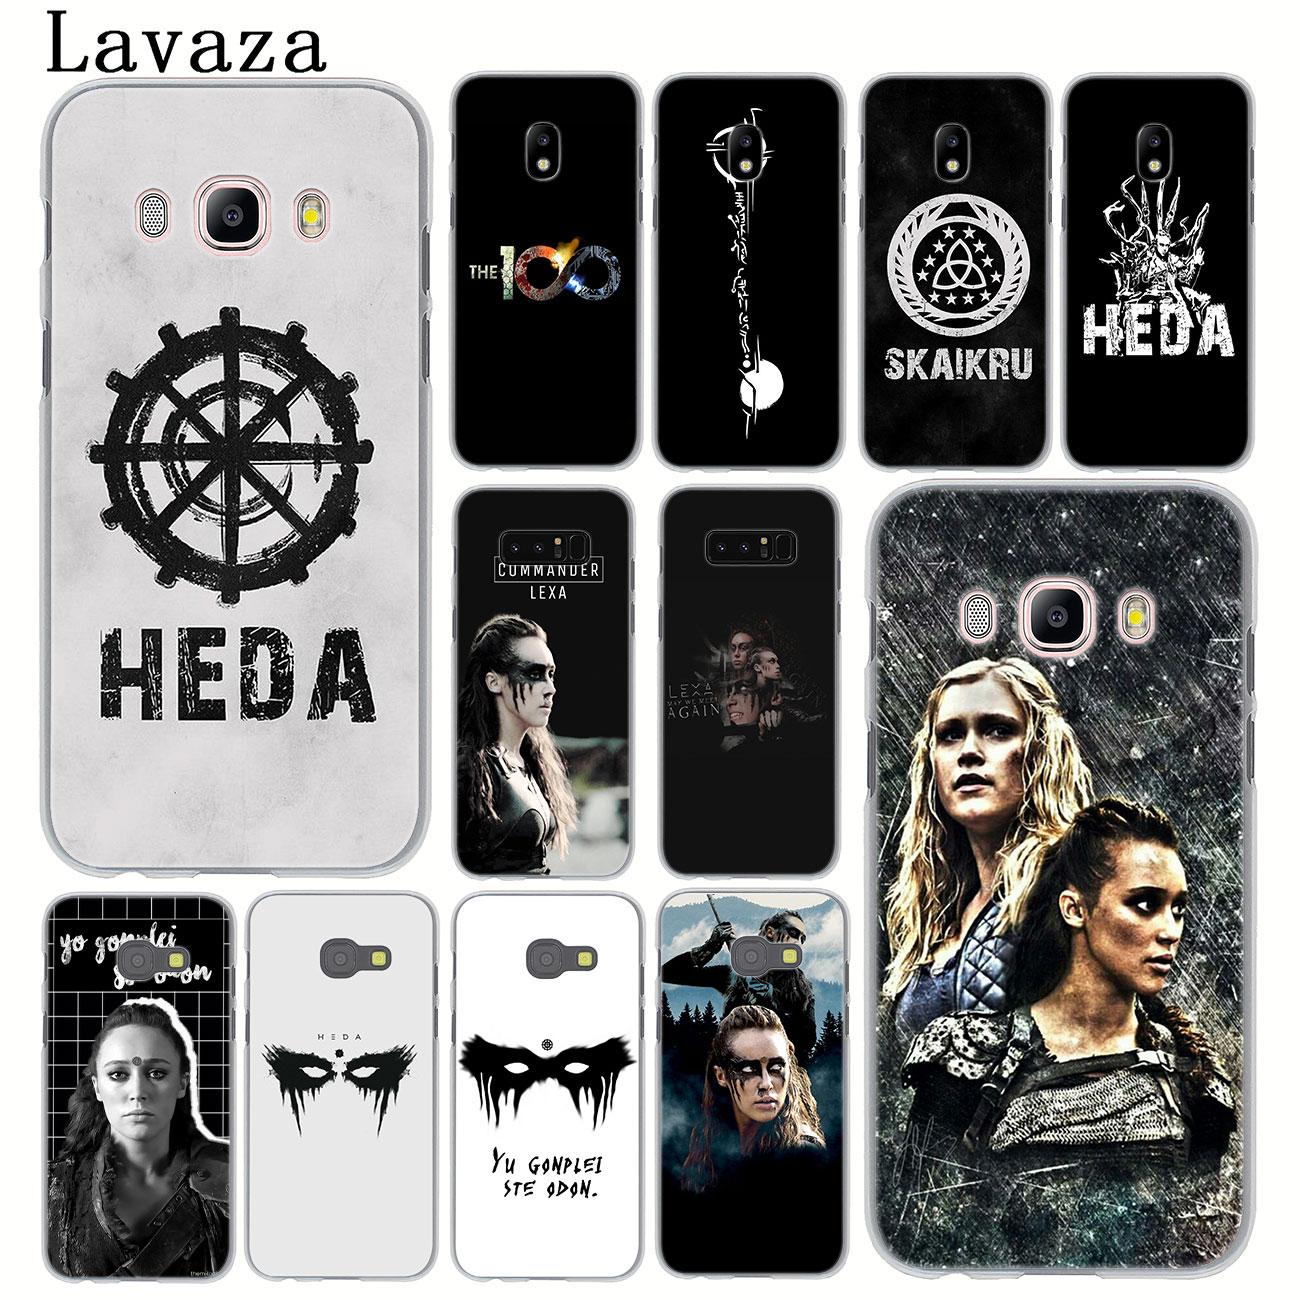 Lavaza 100 Heda Lexa TV mostrar teléfono funda para Samsung Galaxy J8 J7 Duo J6 J5 J4 Plus 2018, 2017 de 2016 J2 J3 UE nos primer 2015